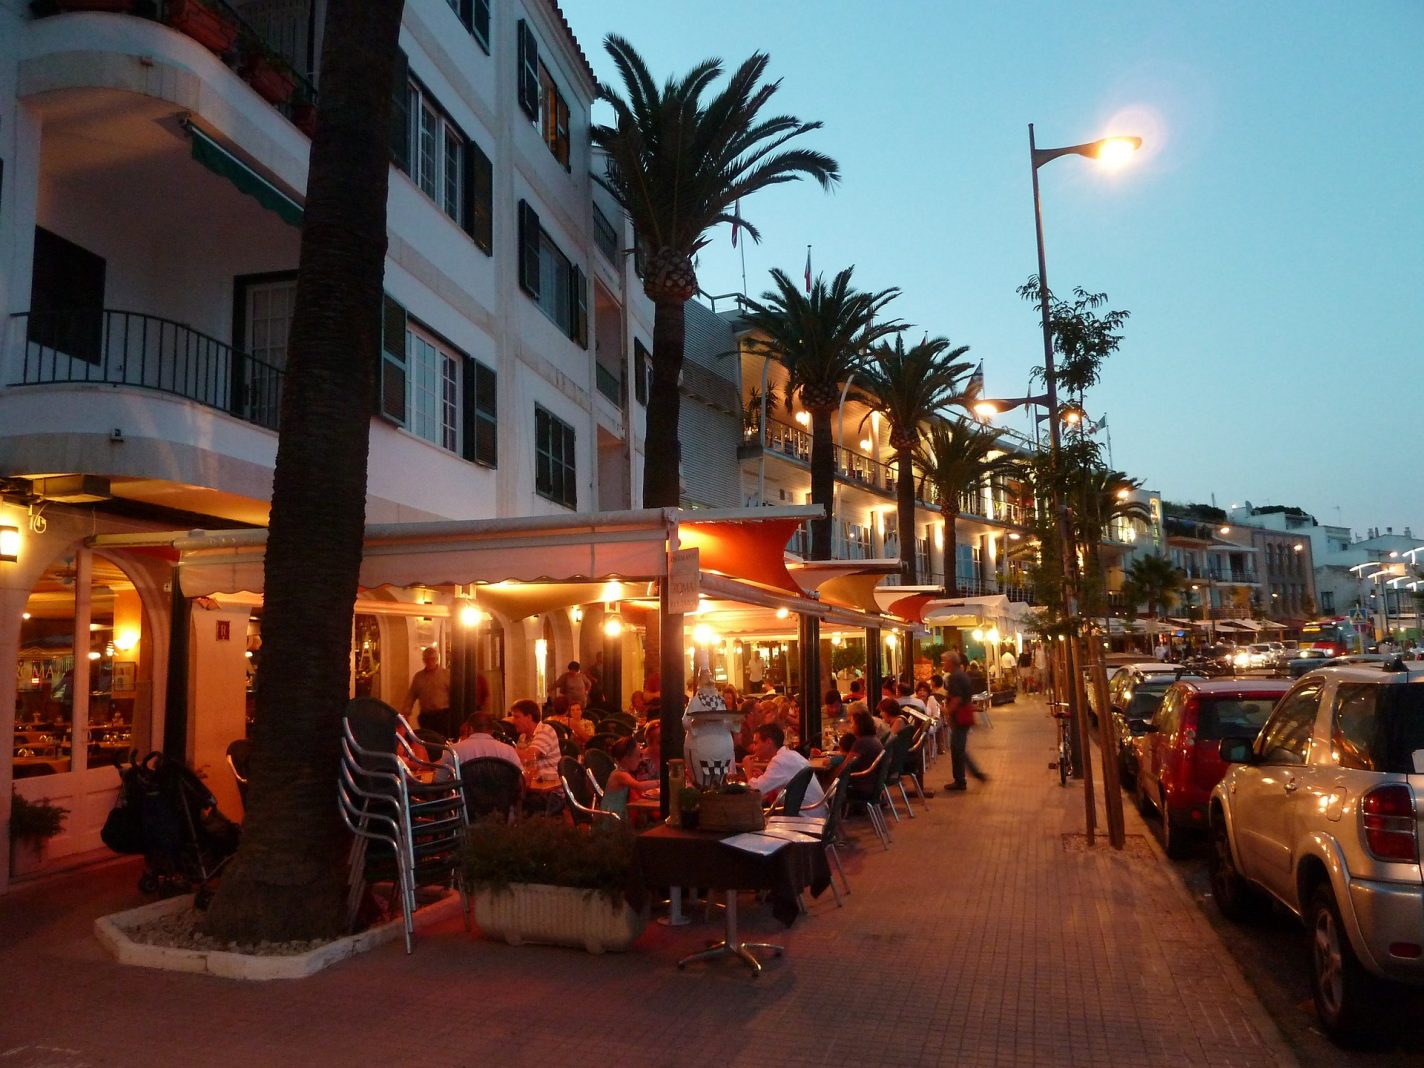 Hoofdstad Mahón, gezellige restaurantjes